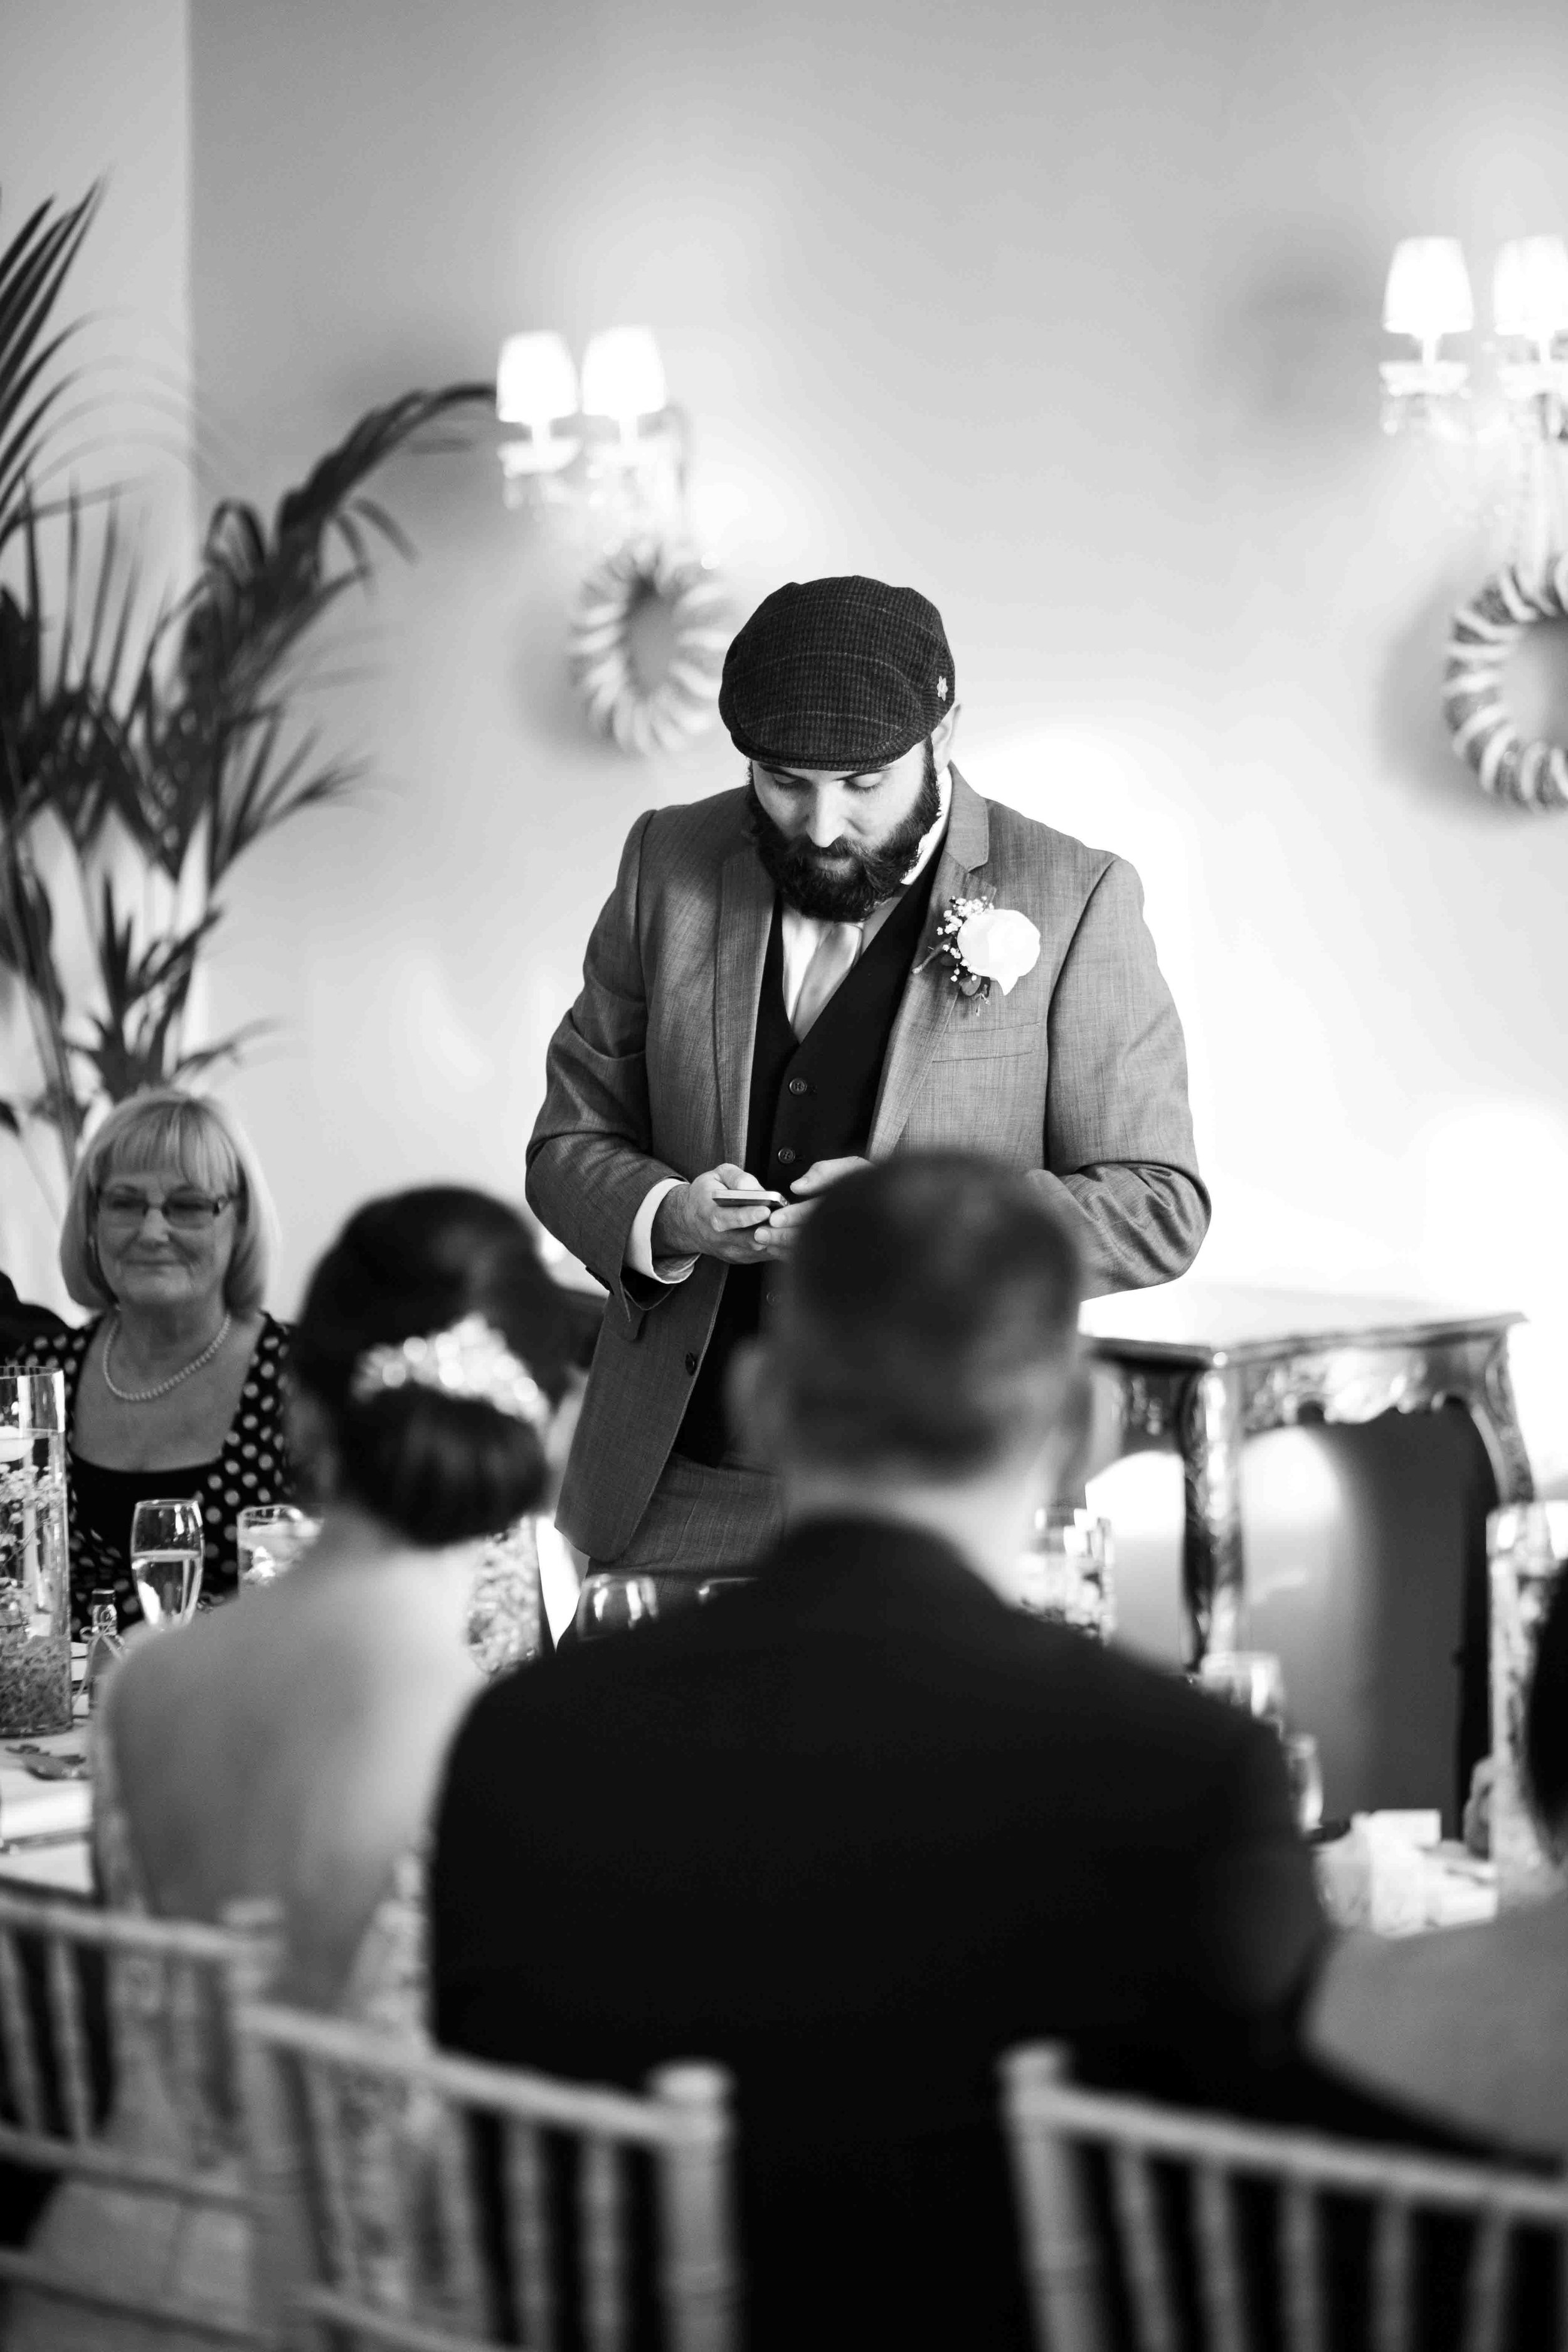 wedding-photos-willenhall-wedding-photographer-wolverhampton-wedding-photographer-west-midlands-wedding-photographer-birmingham-groom-speech.jpg